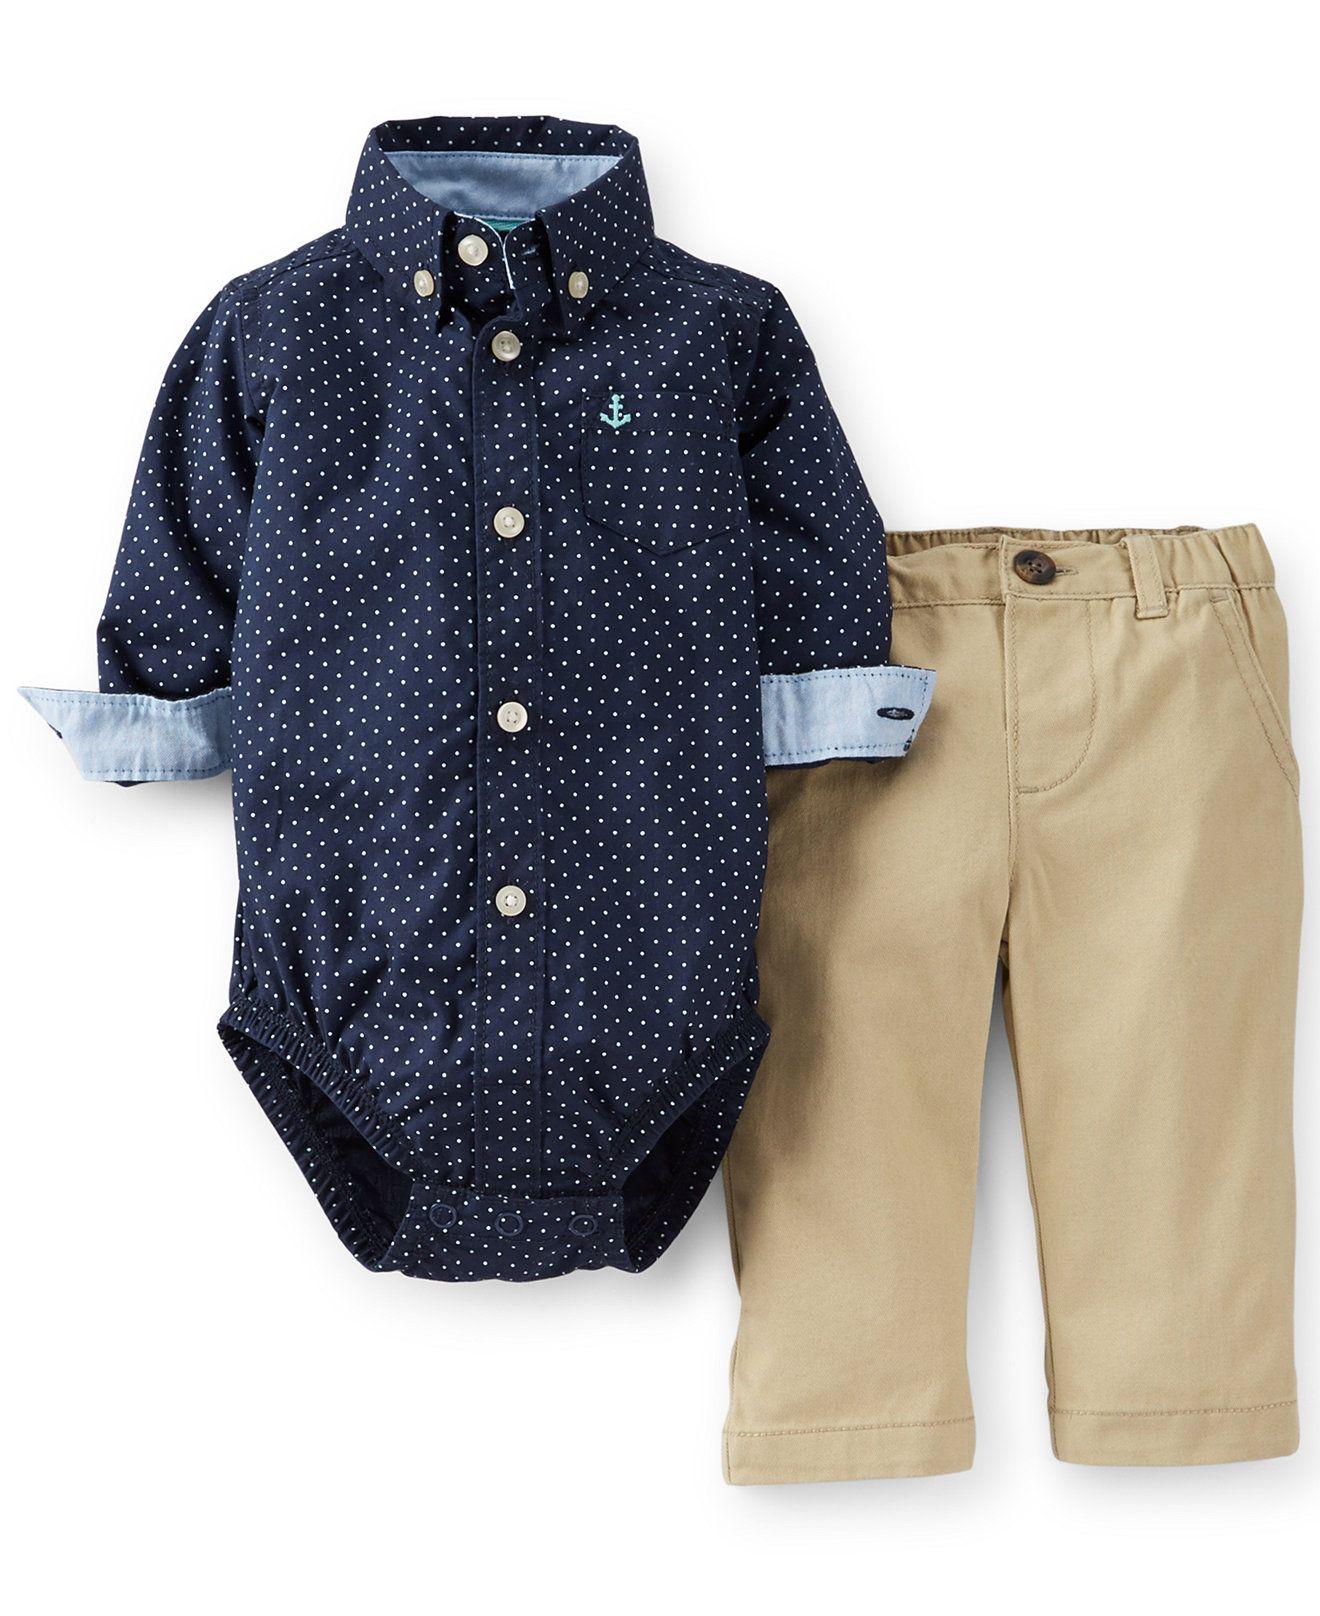 ce264e573 Carter's Baby Boys' 2-Piece Bodysuit & Khakis Set - Kids Baby Boy (0-24  months) - Macy's